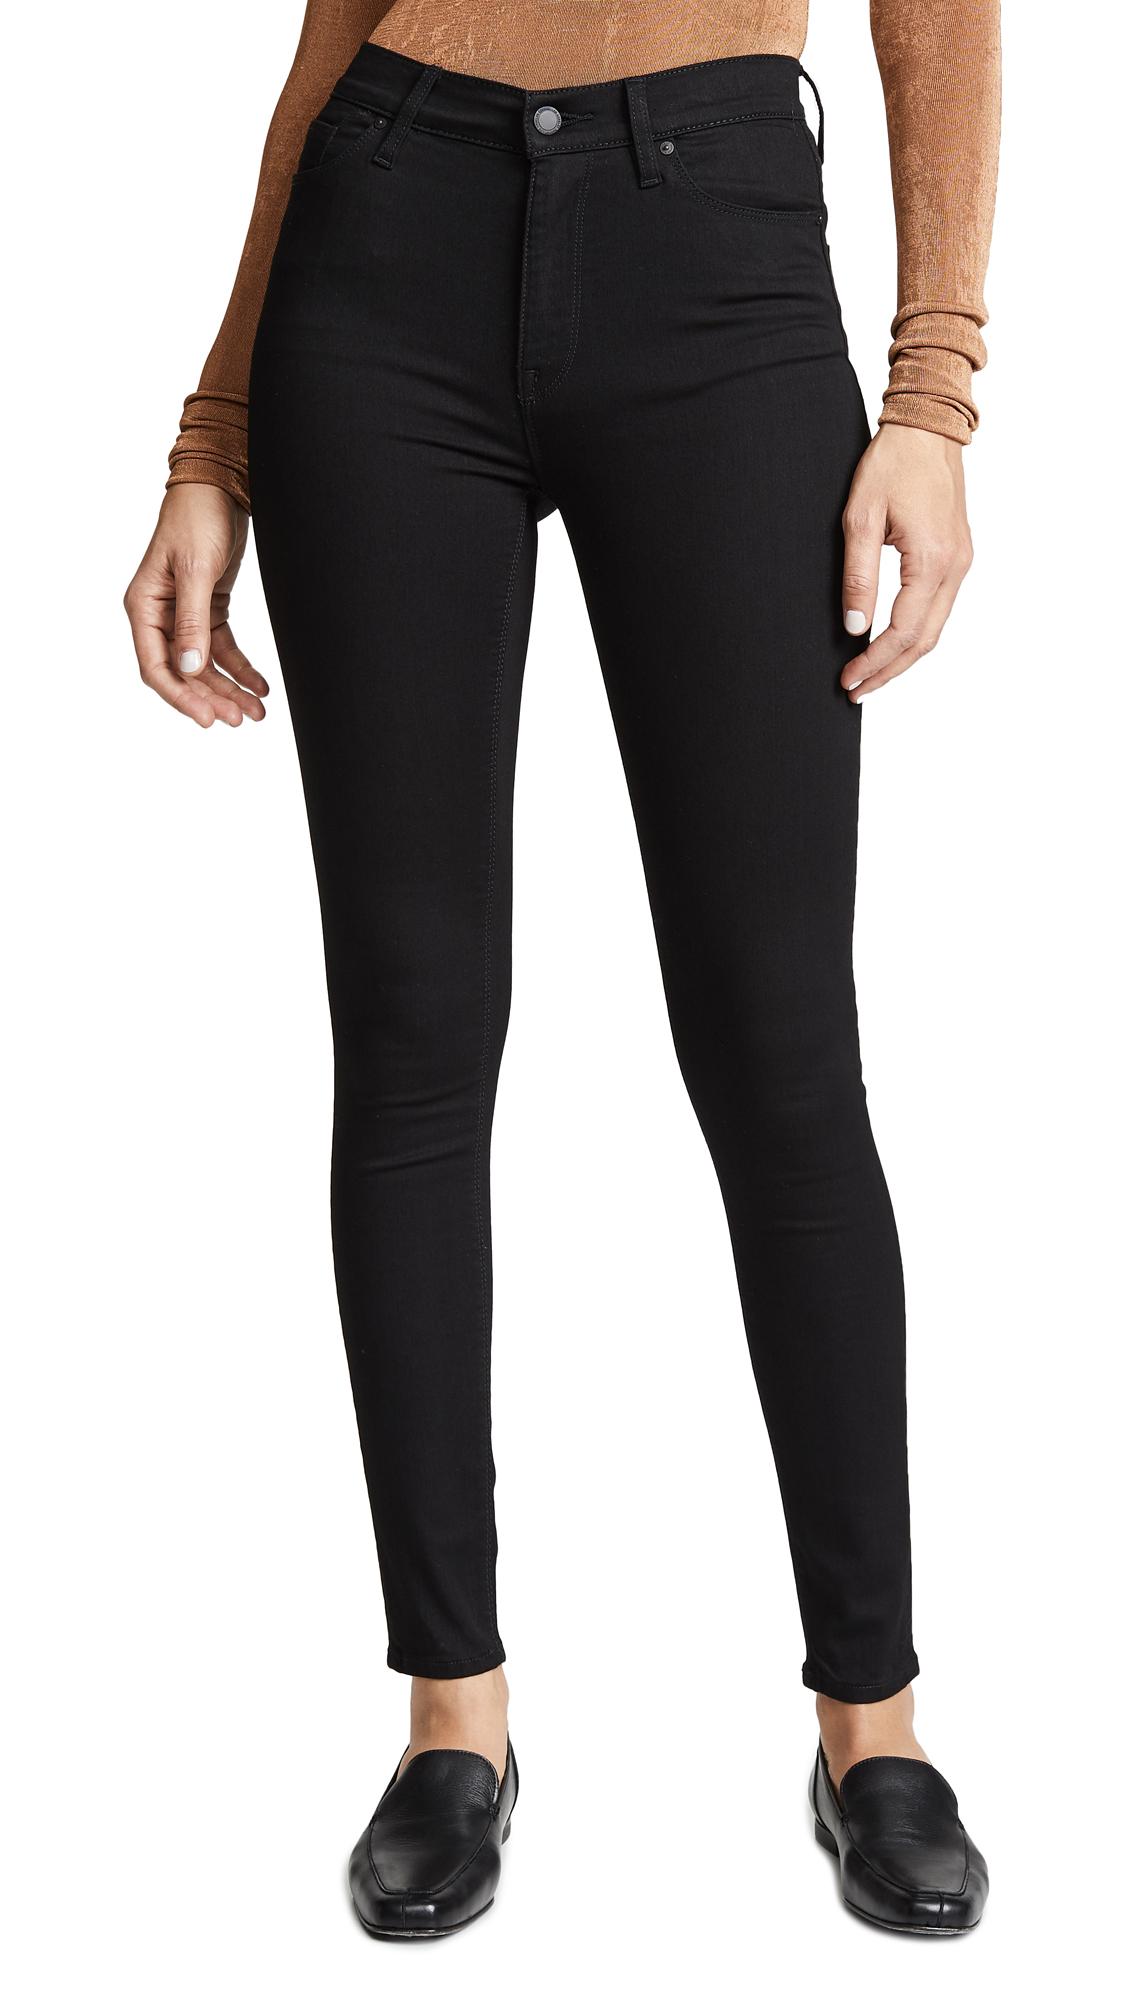 Hudson Barbara High Waisted Skinny Jeans In Black